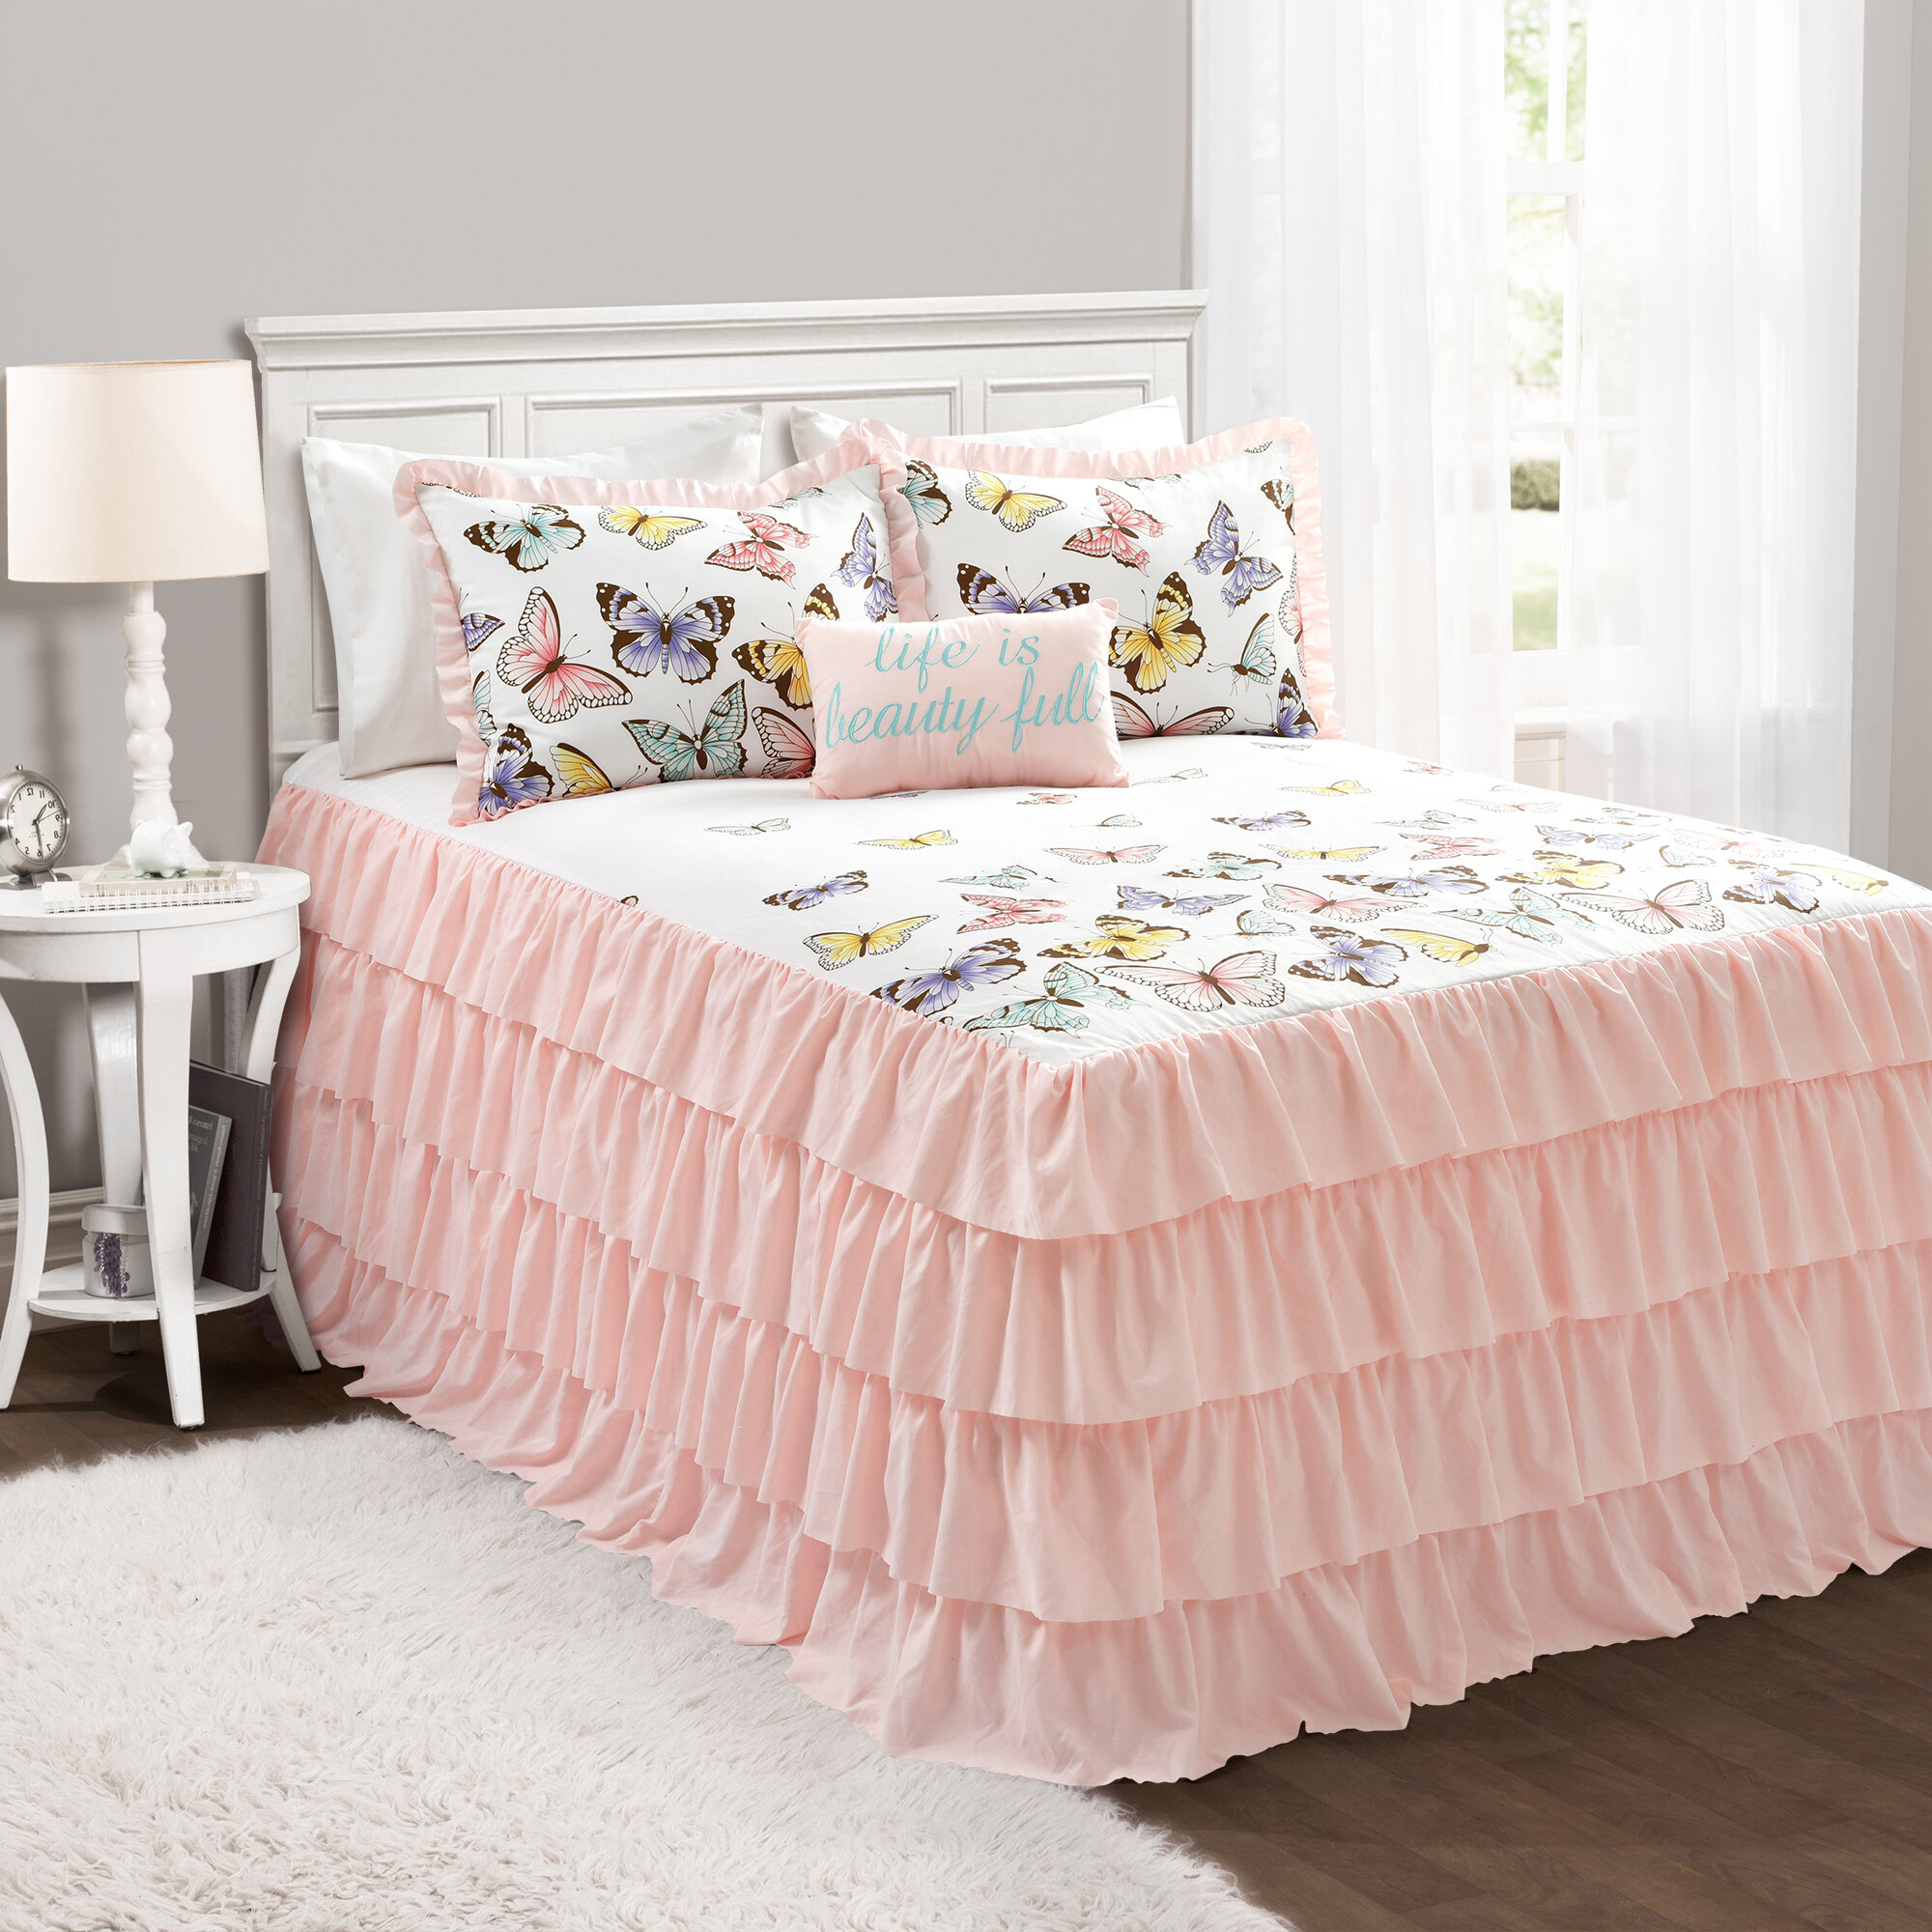 Pink Duvet Covers Flutter Butterflies Floral Reversible Bedding Quilt Sets Duvet Covers Bedding Sets Home Garden